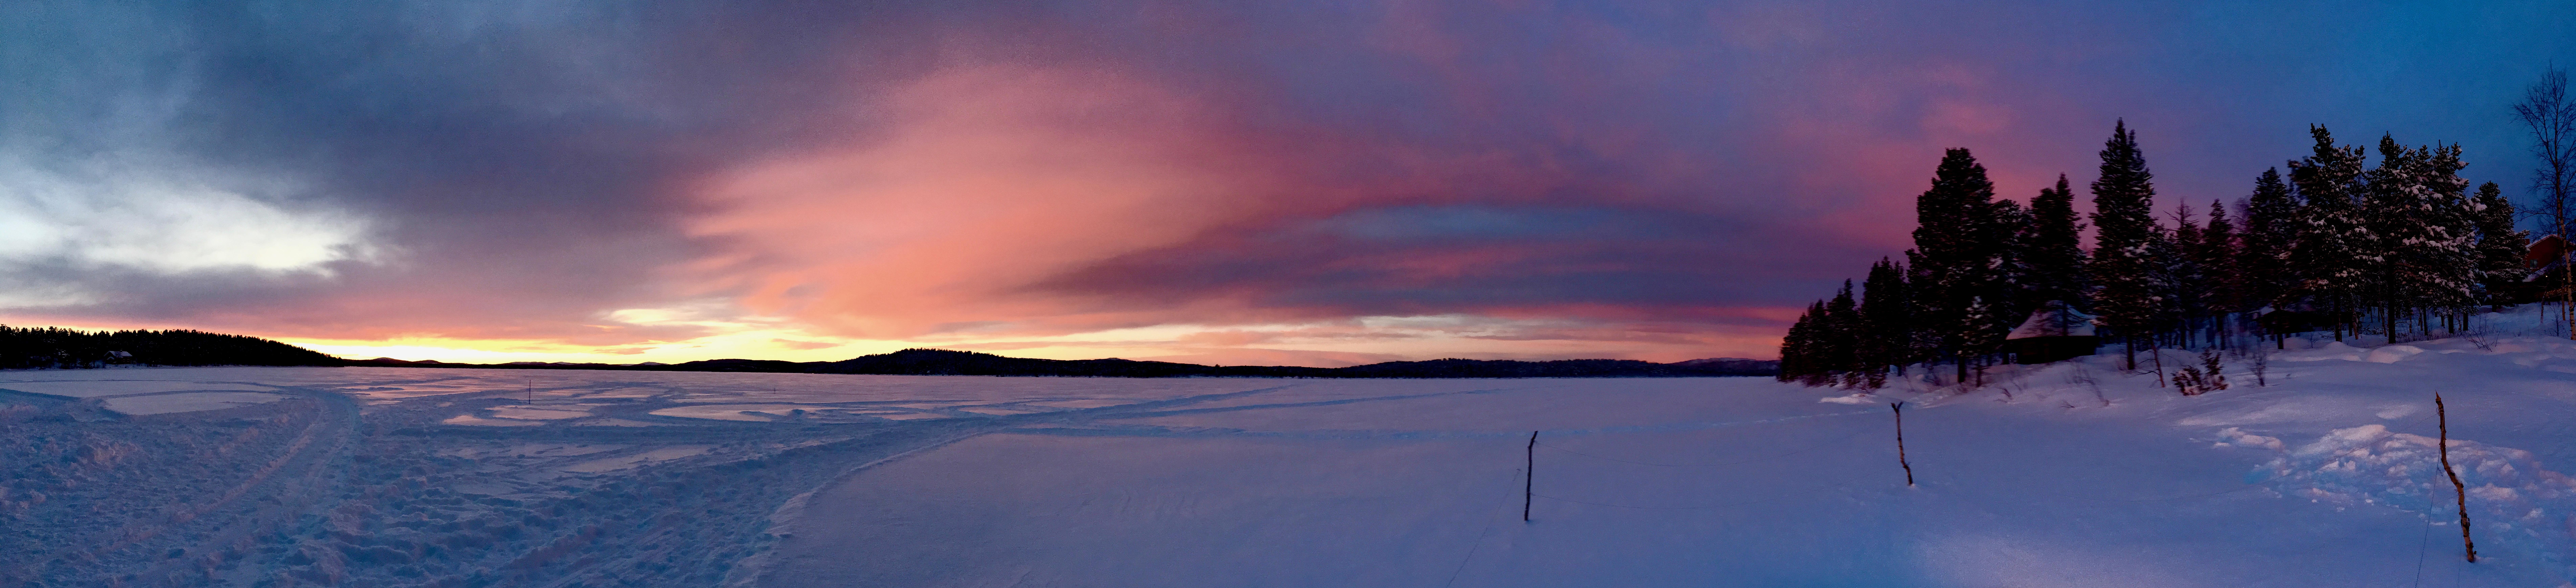 Polarnacht in Finnland